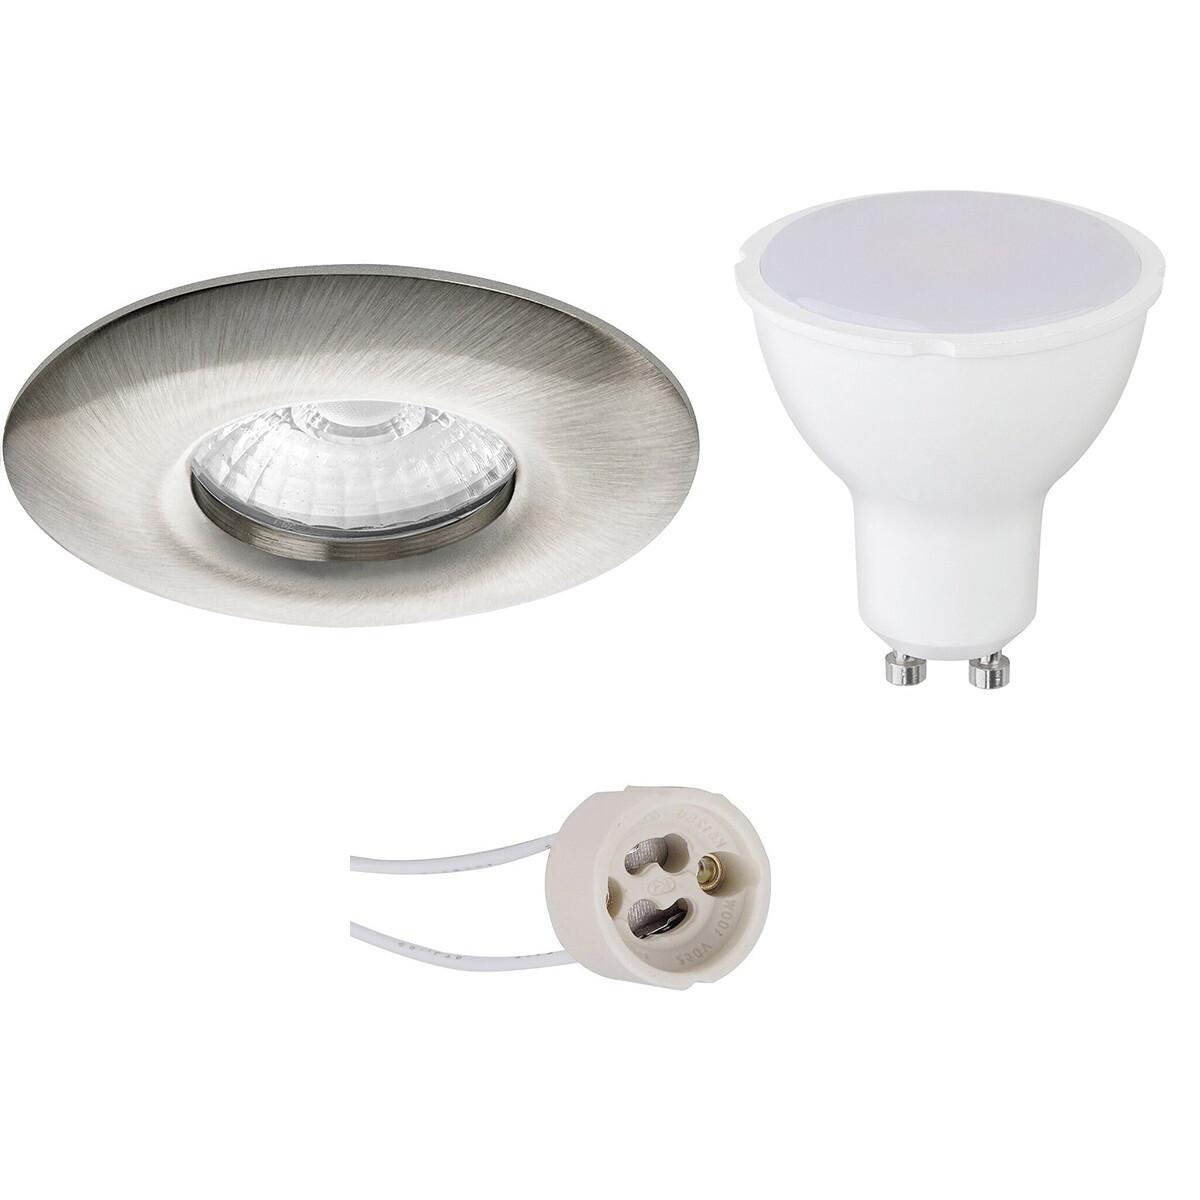 LED Spot Set - Pragmi Luno Pro - Waterdicht IP65 - GU10 Fitting - Inbouw Rond - Mat Nikkel - 4W - Wa